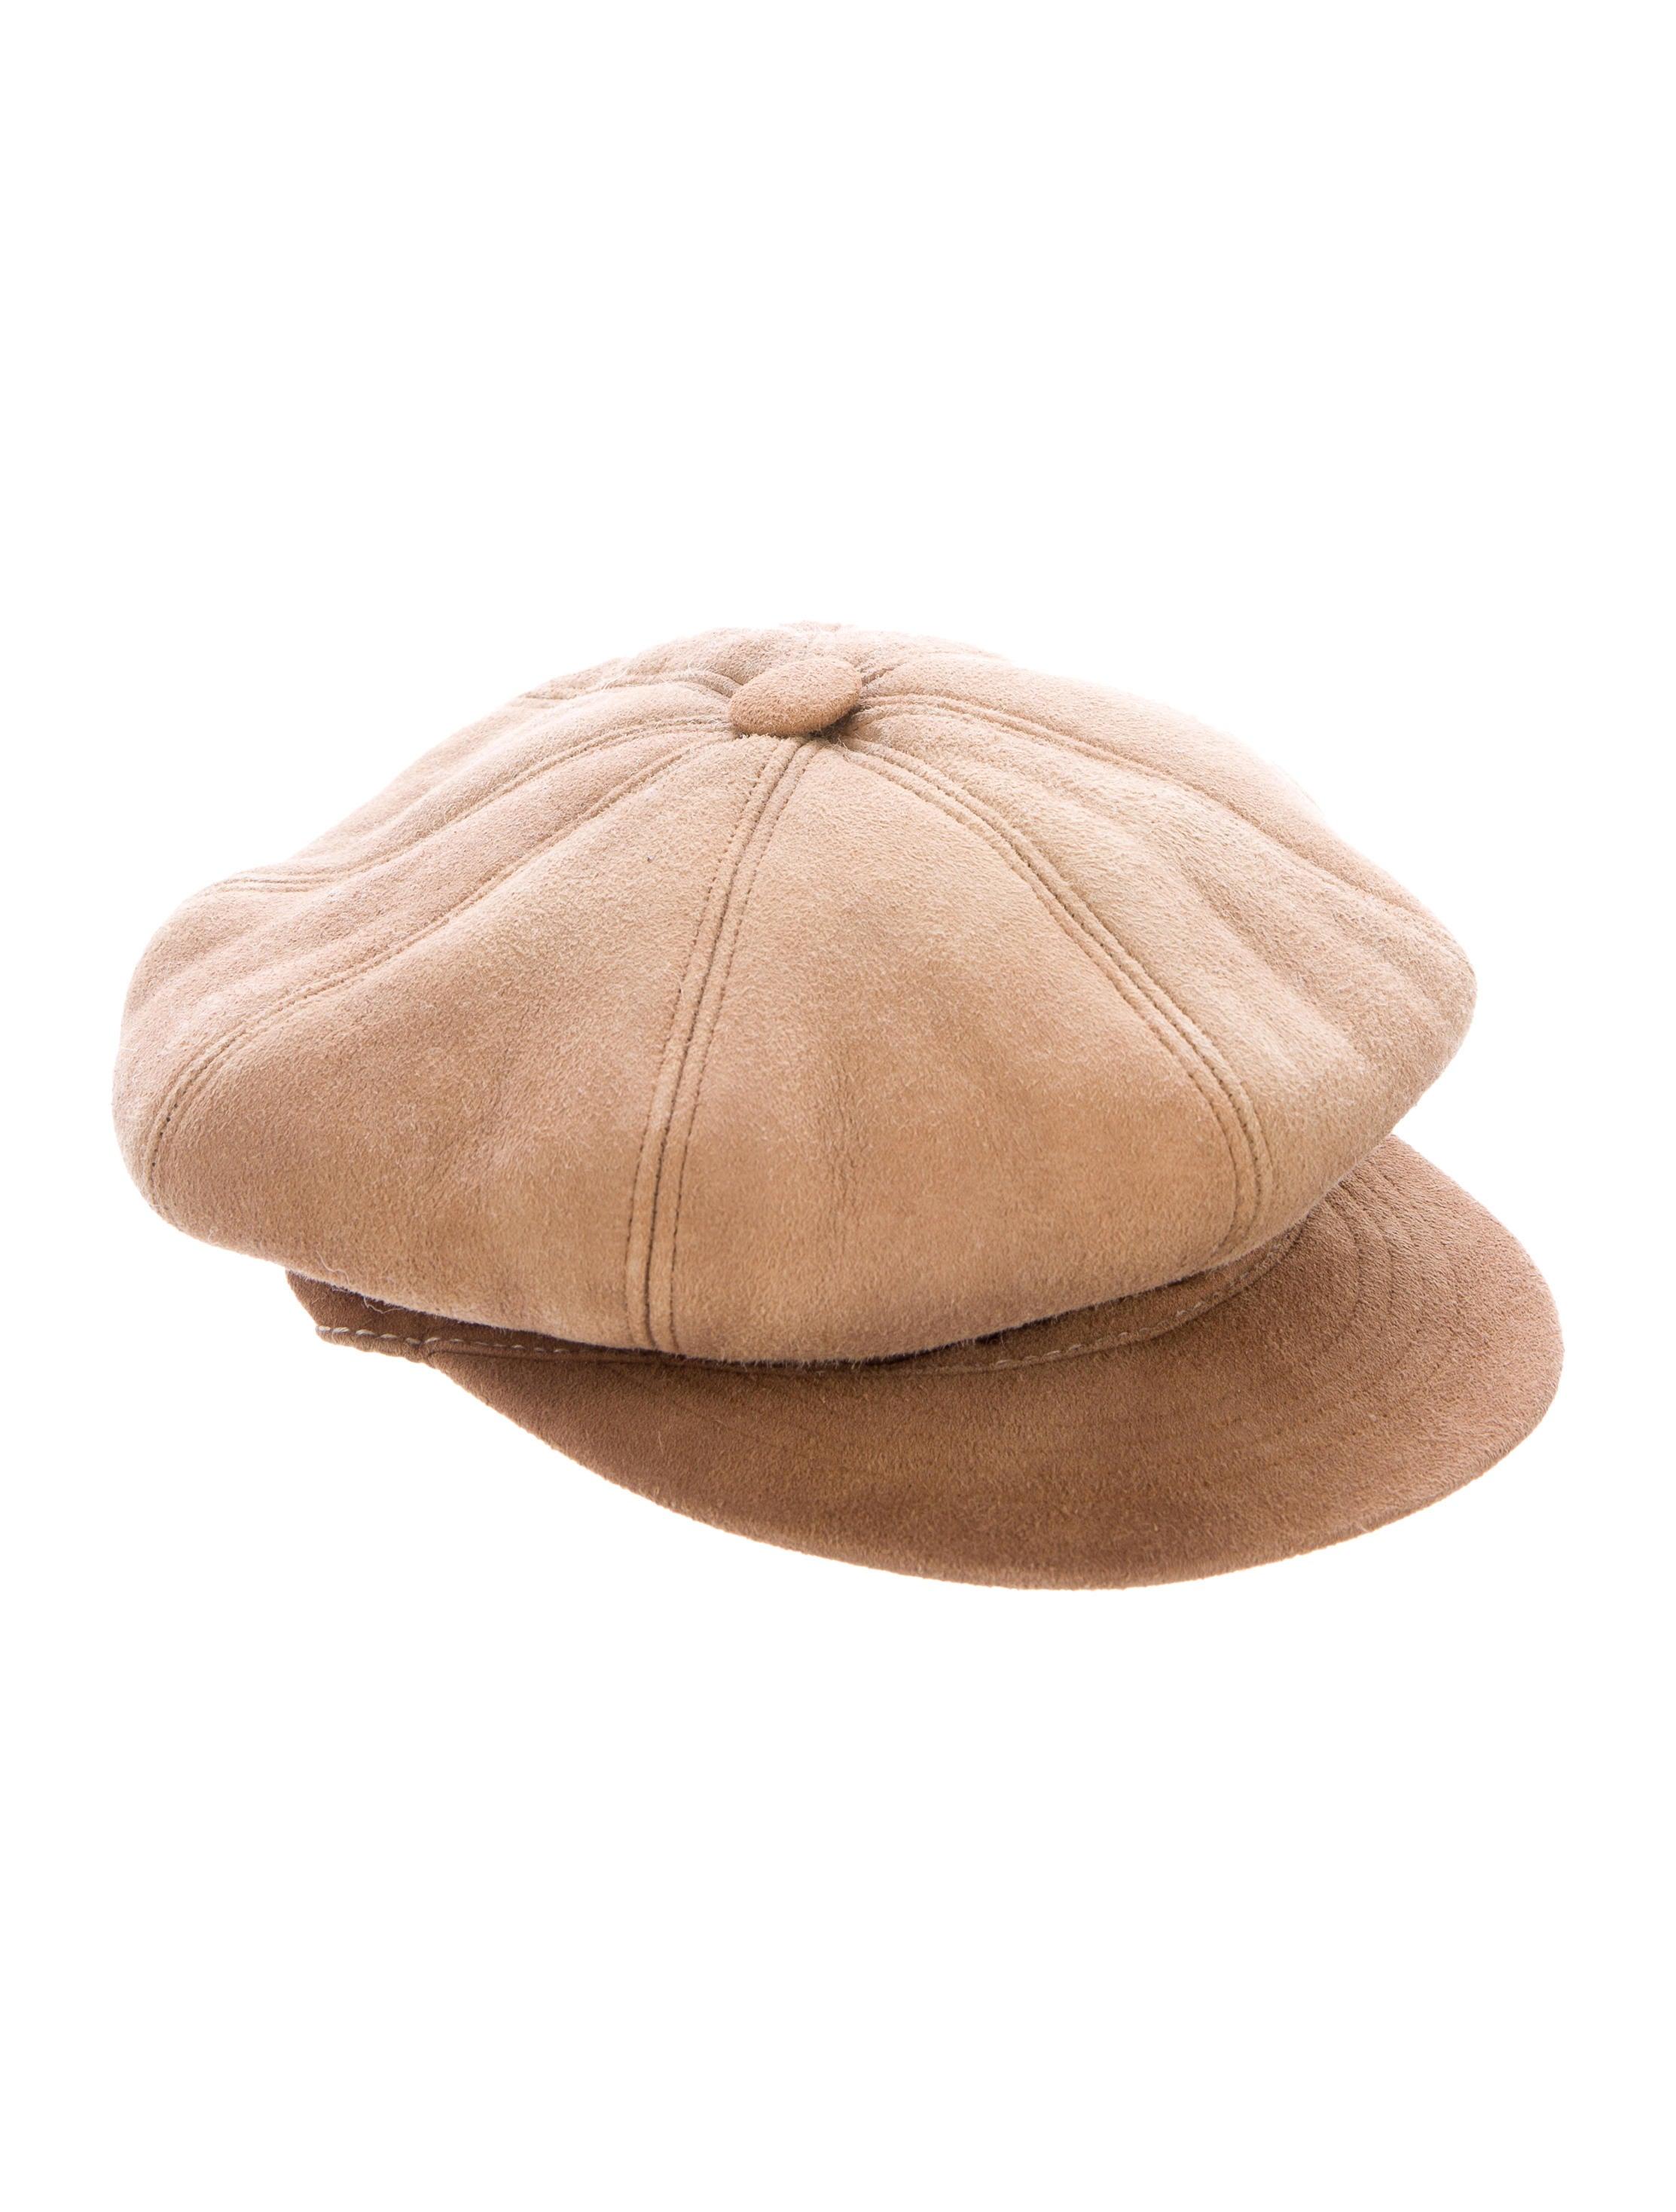 UGG Australia Shearling Newsboy Hat - Accessories - WUUGG20256  4cc06fd673b7